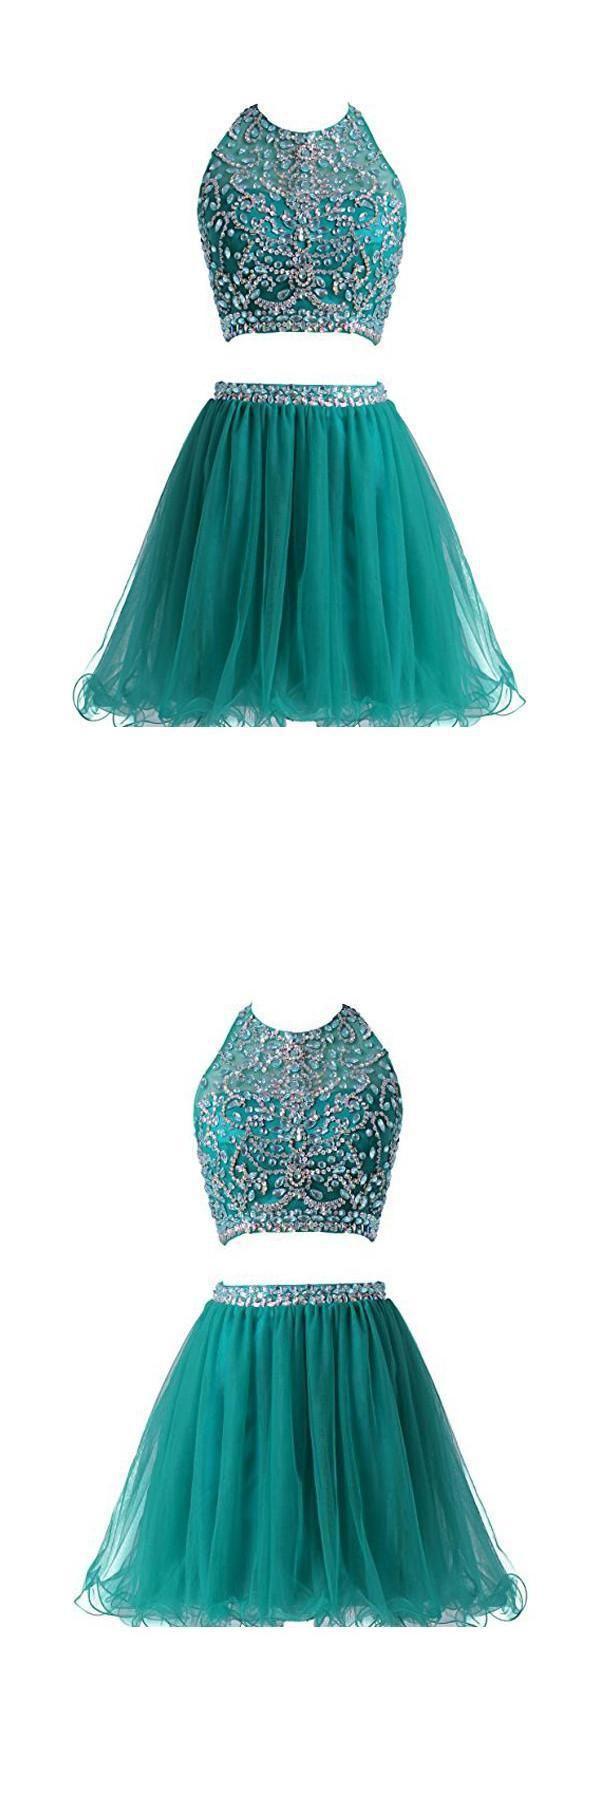 Prom dress short two pieces prom dress custom made prom dress